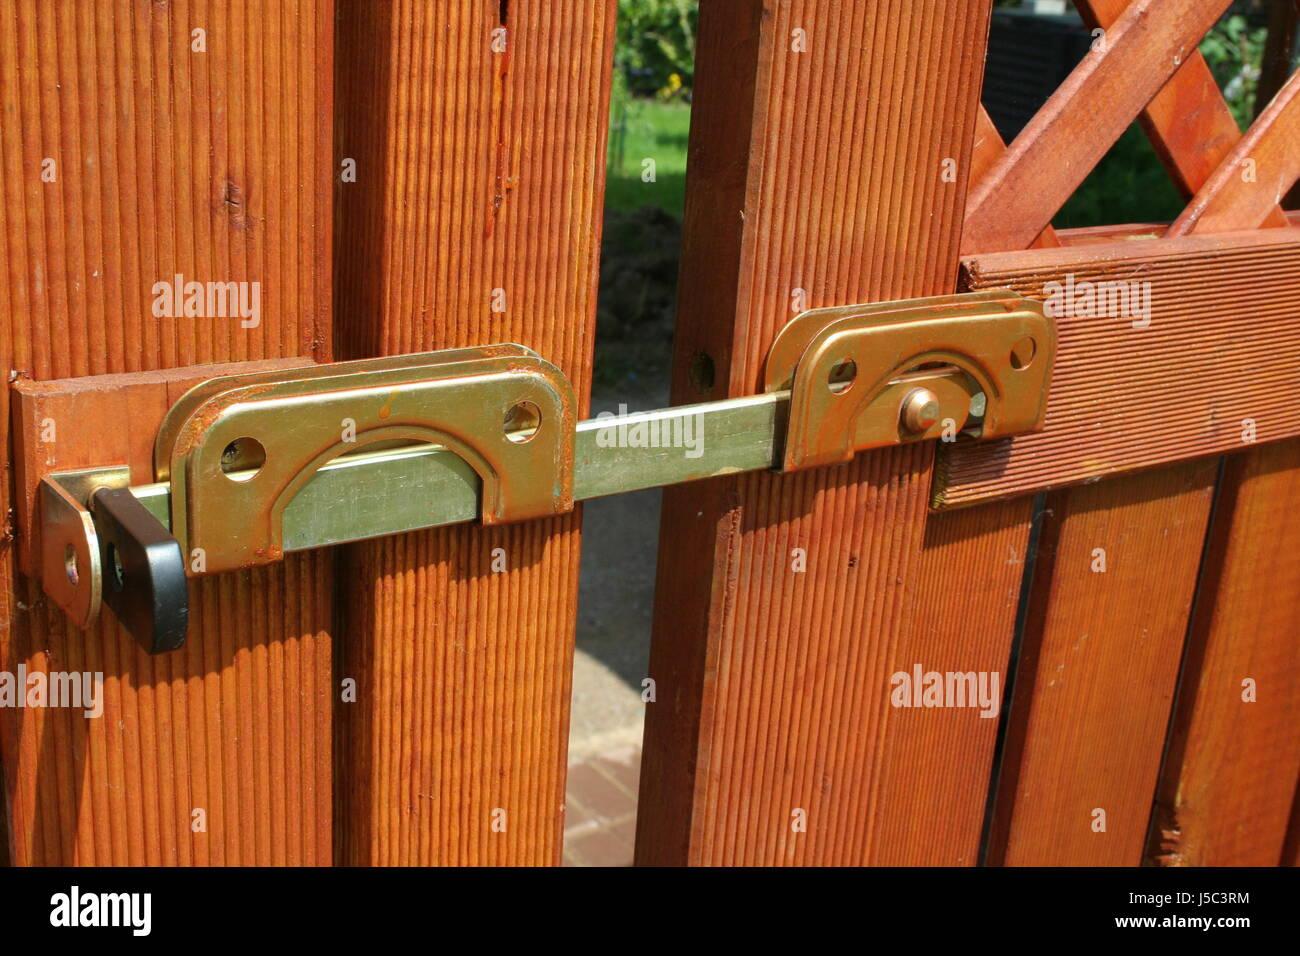 garden gate lock bolt stockfotos garden gate lock bolt bilder alamy. Black Bedroom Furniture Sets. Home Design Ideas